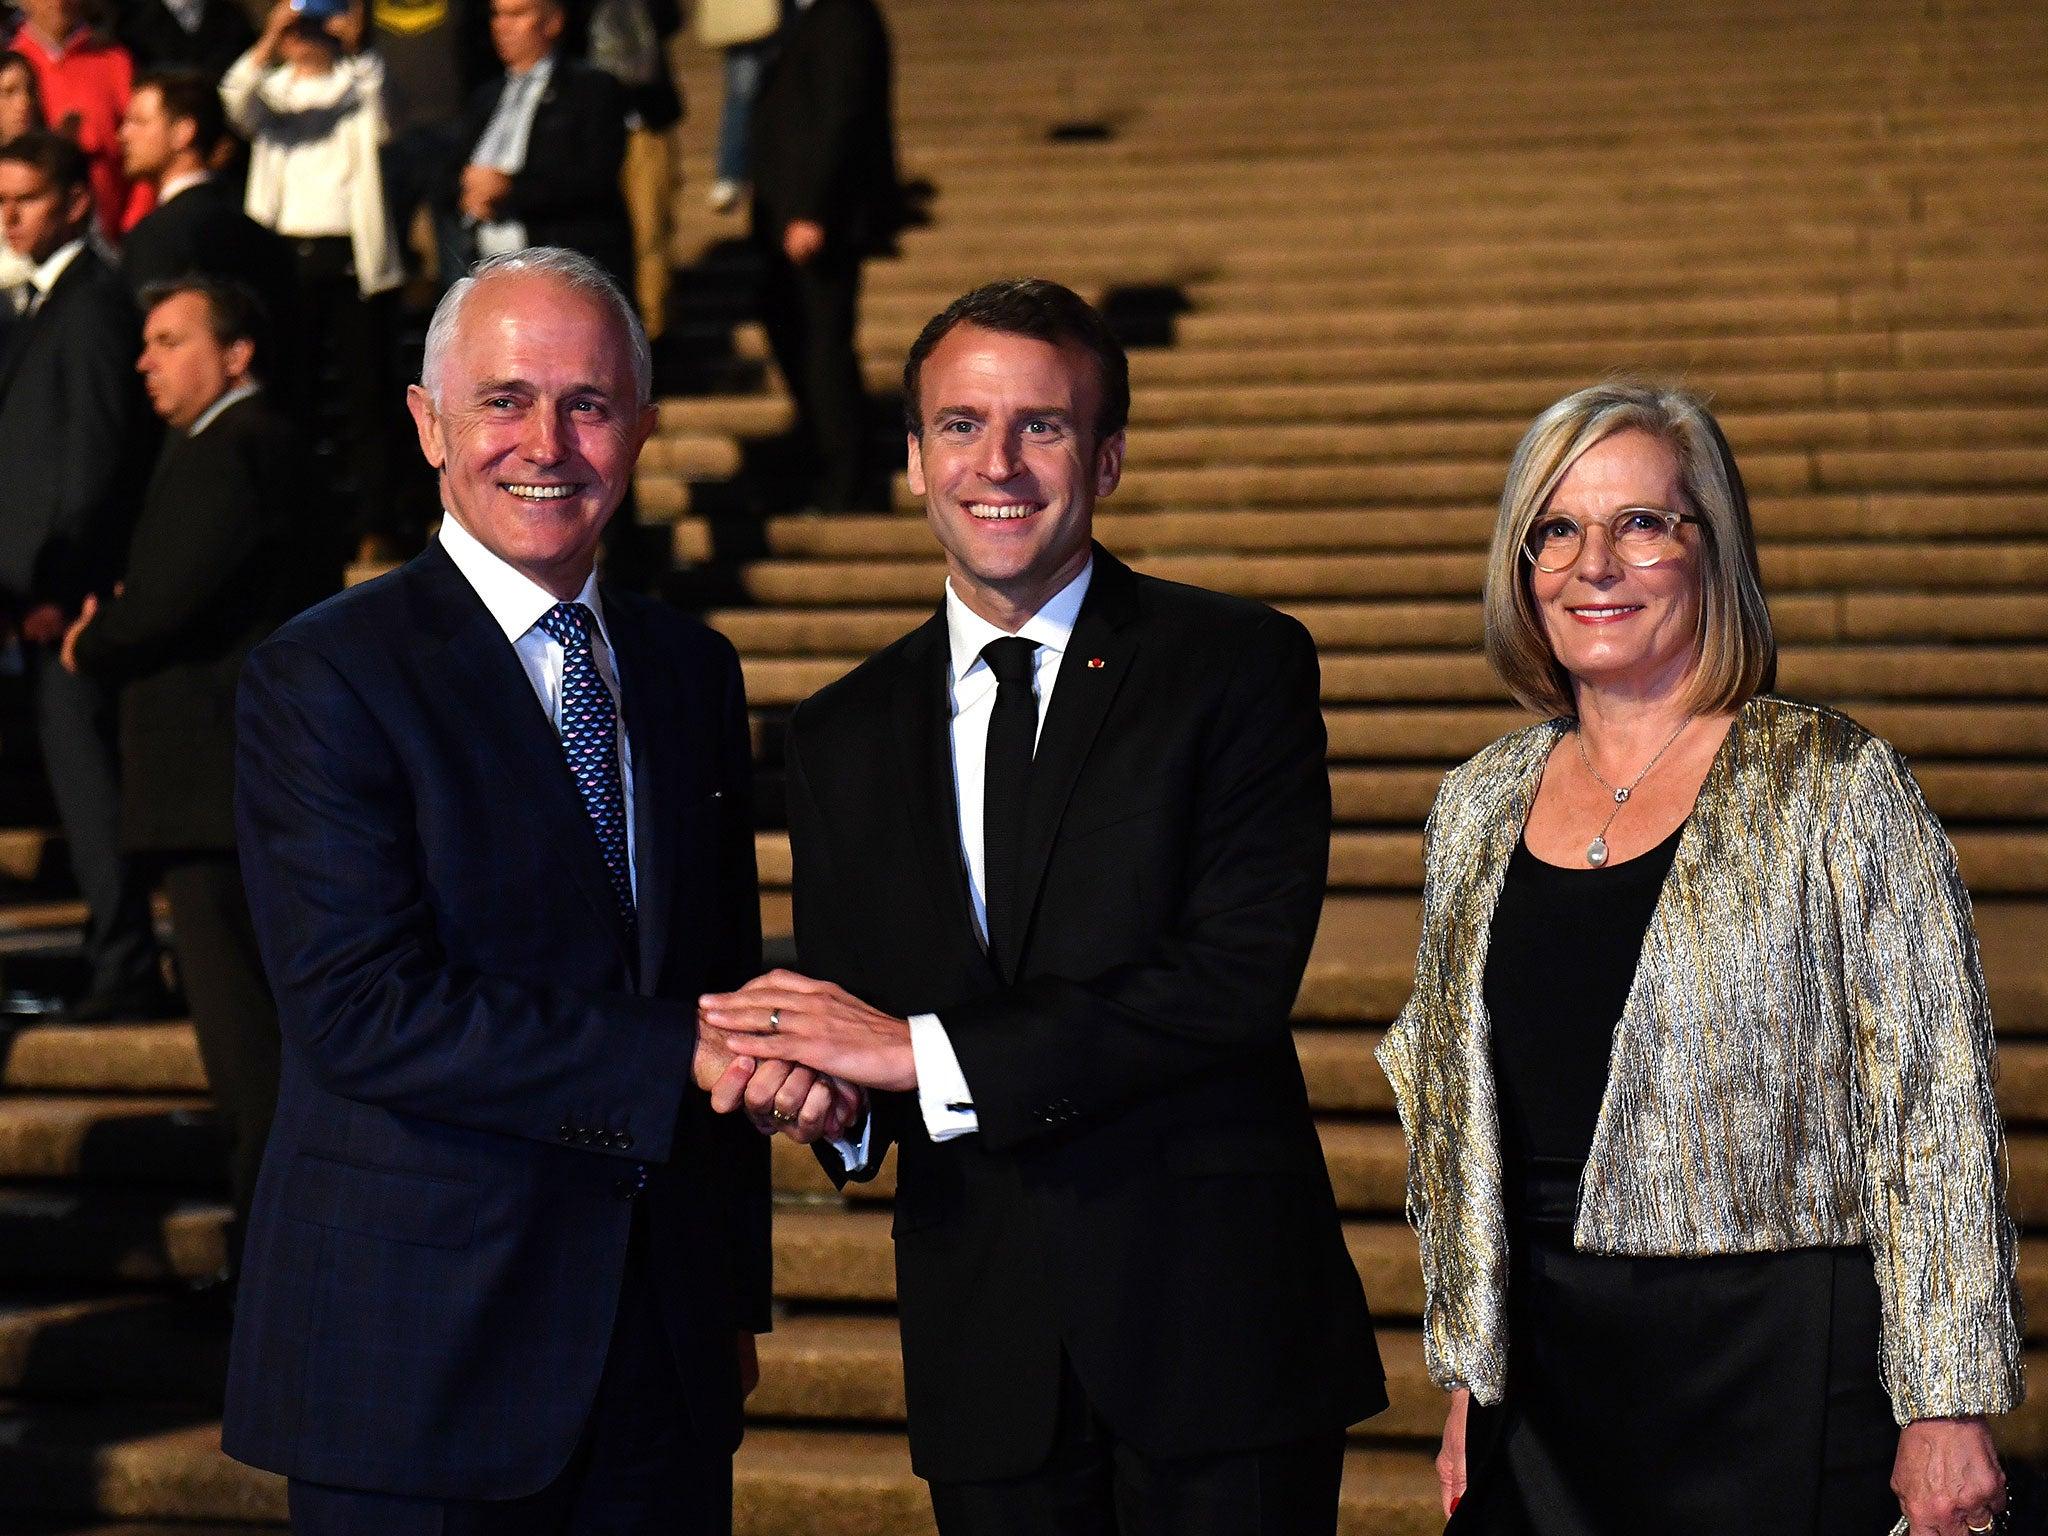 Macron calls Australian prime minister Malcolm Turnbull's wife 'delicious'